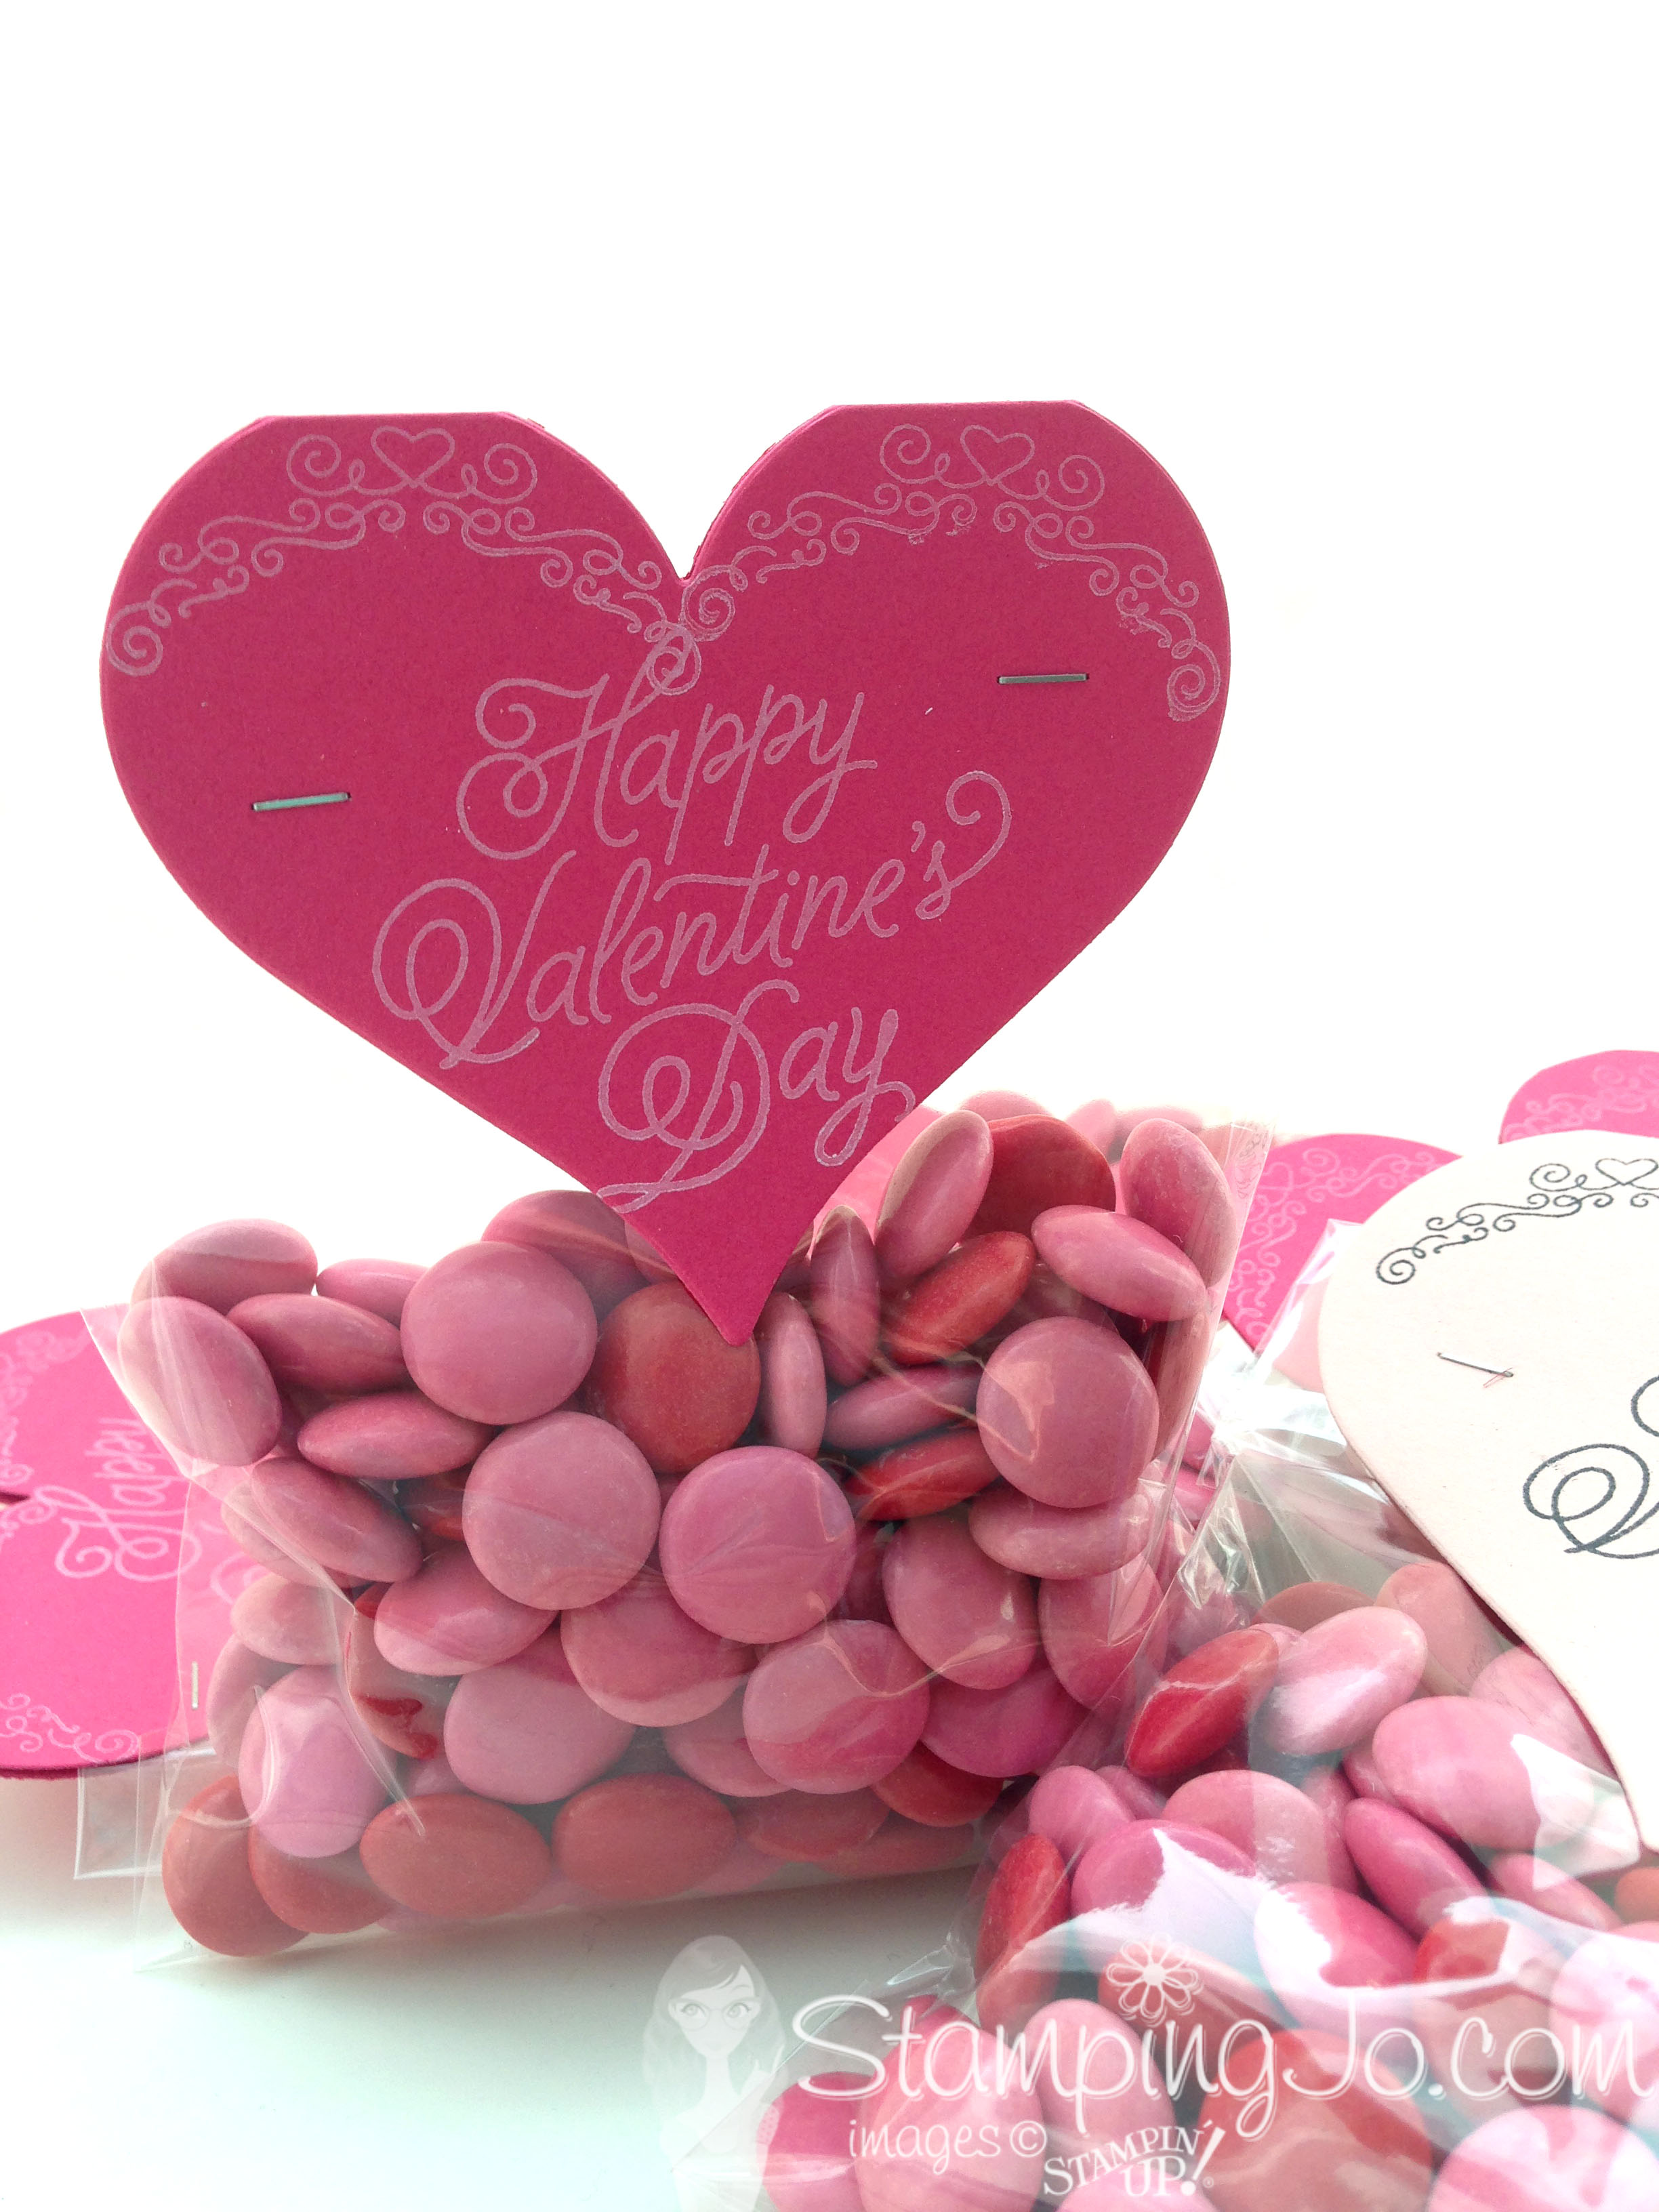 Sweet & Sassy Framelits, Sealed With Love, Valentine treat bag, Stampin Up